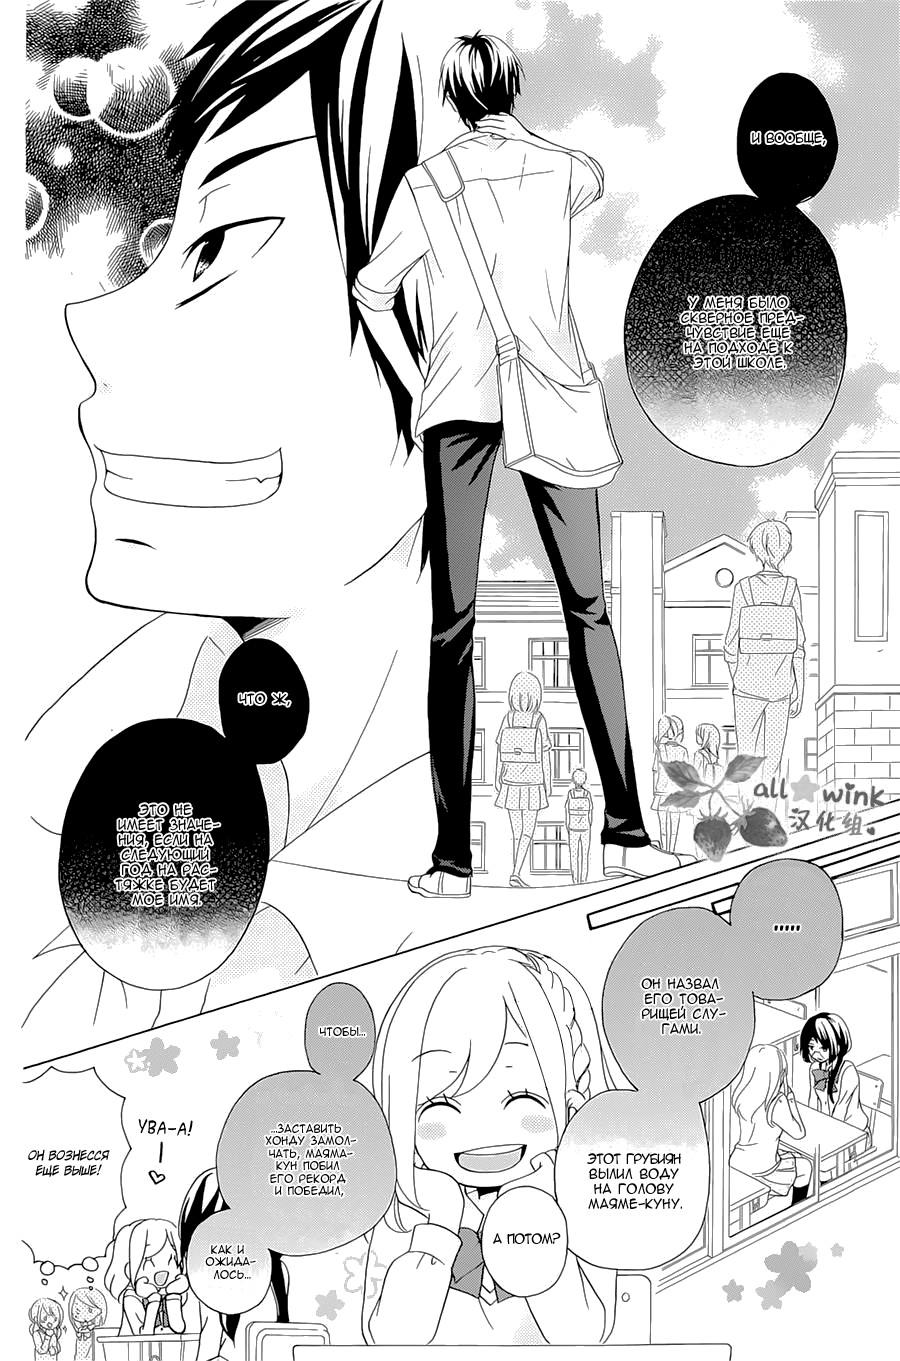 https://r1.ninemanga.com/comics/pic2/10/27402/302127/1463422157424.jpg Page 4